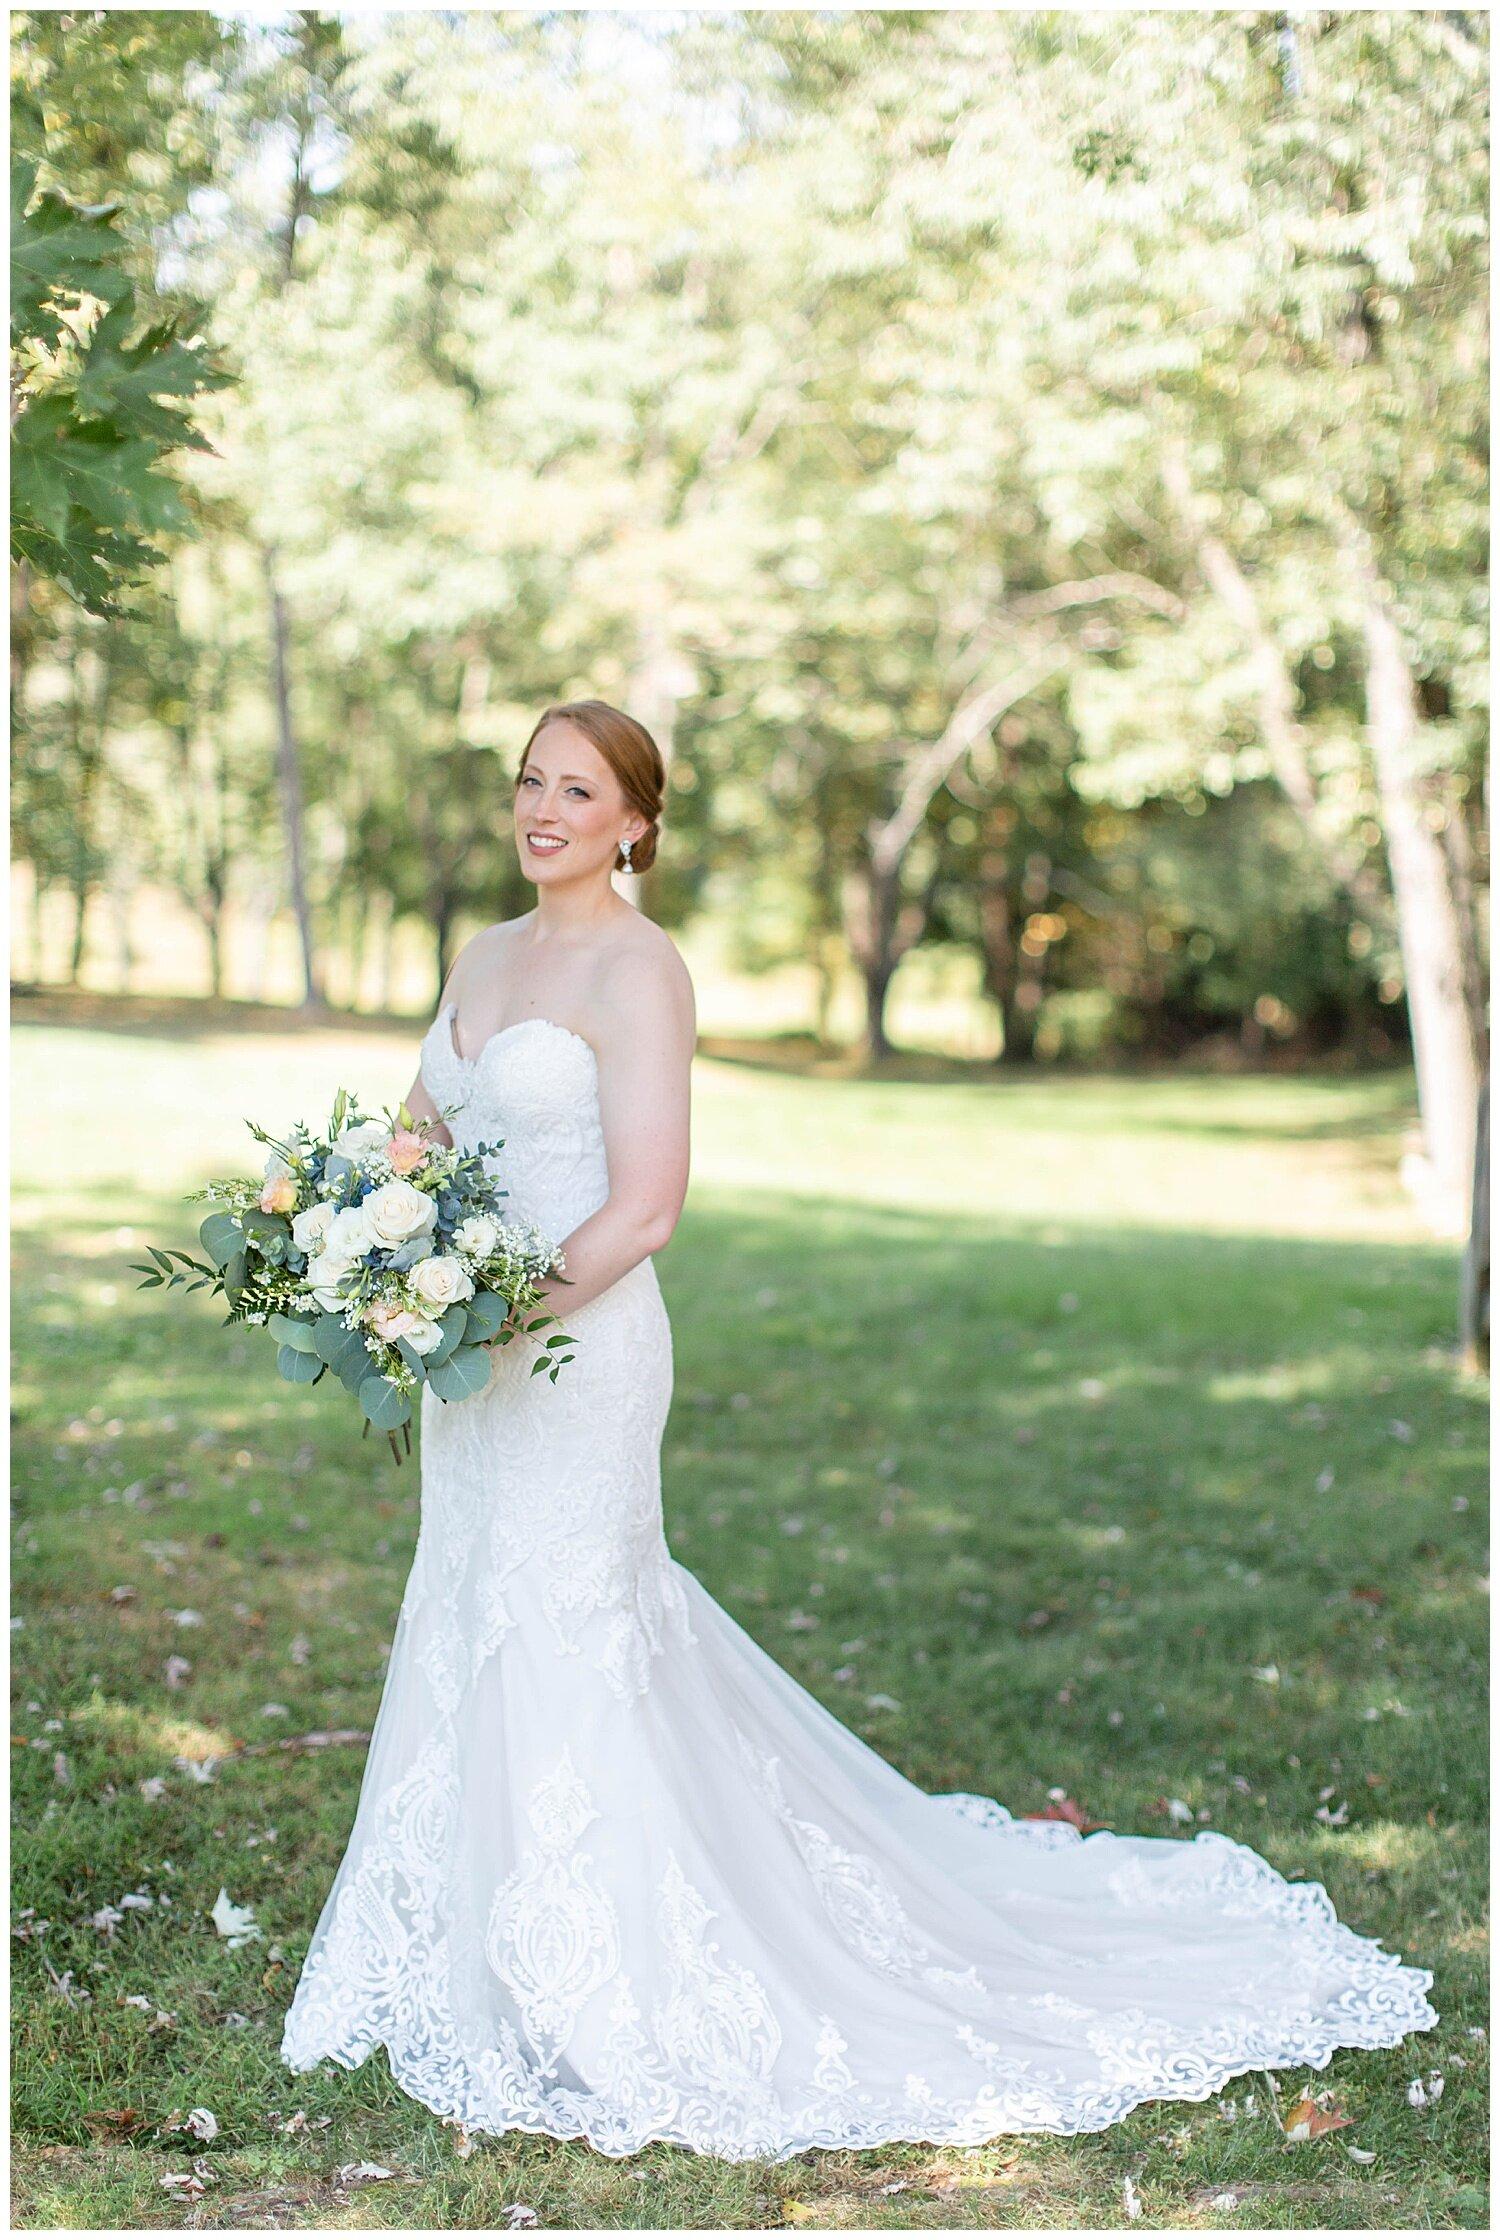 maryland_wedding_emily_belson_photography_0004.jpg